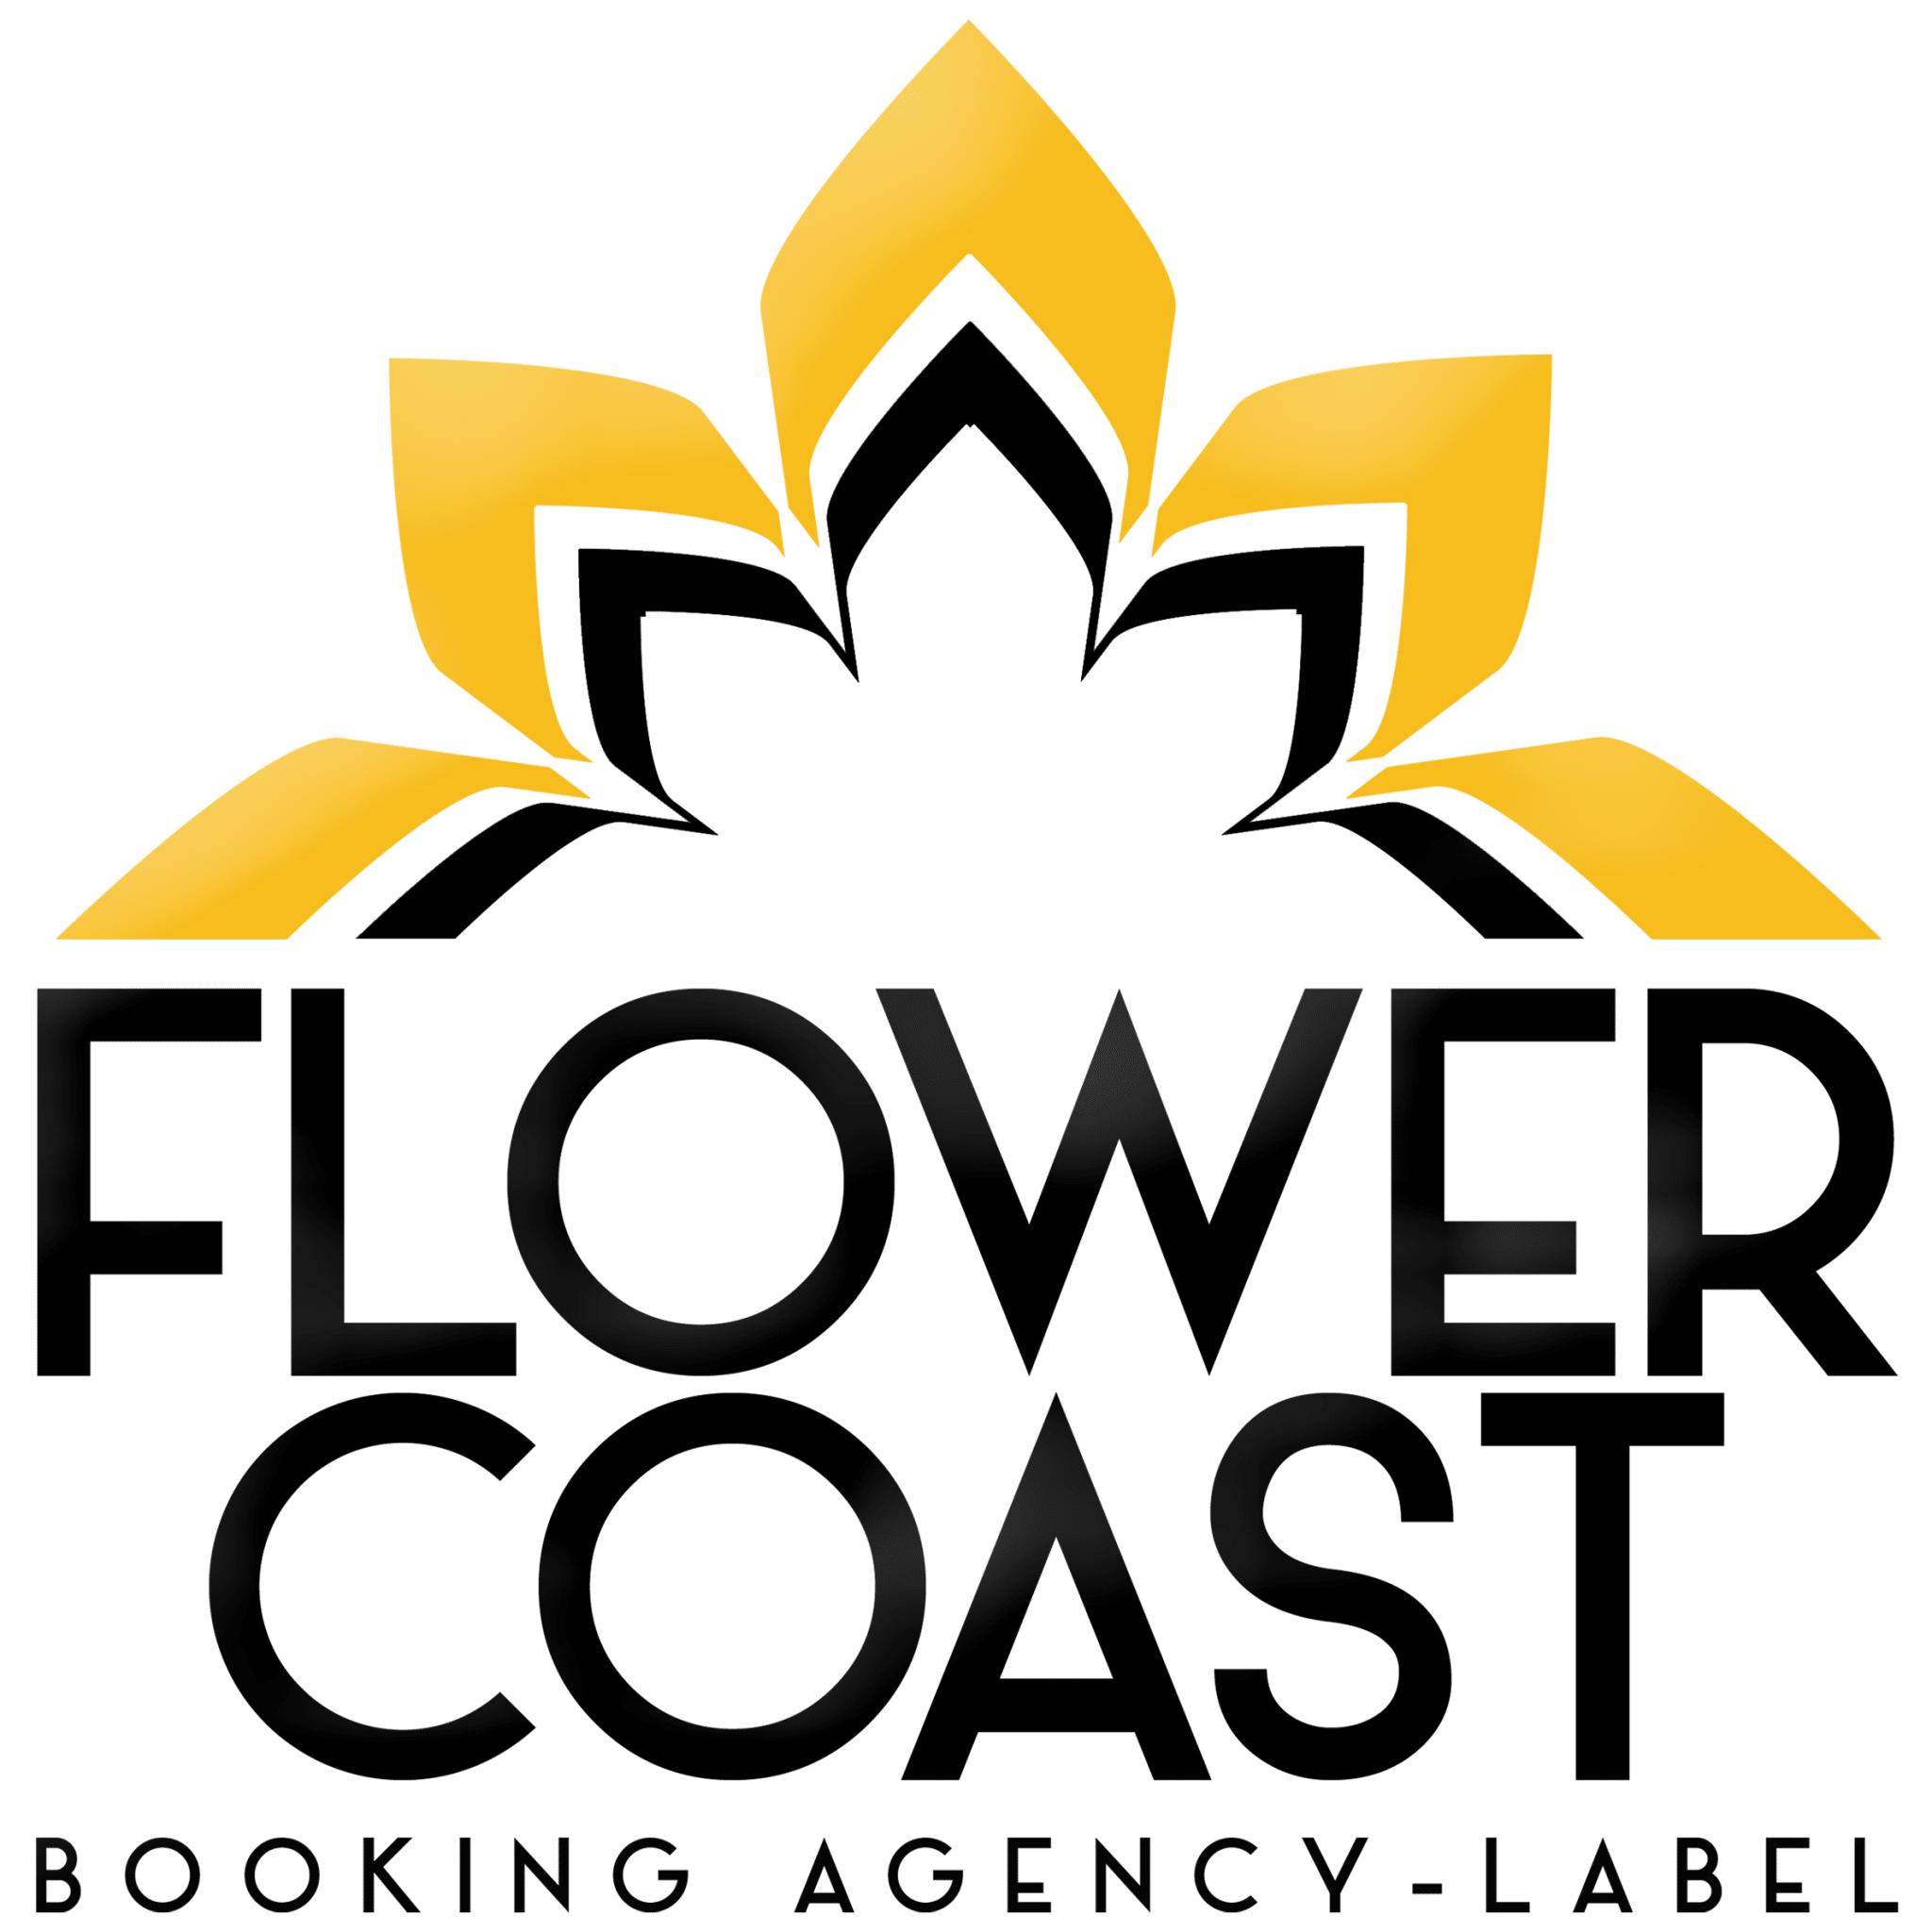 MIMA#6 Flower coast